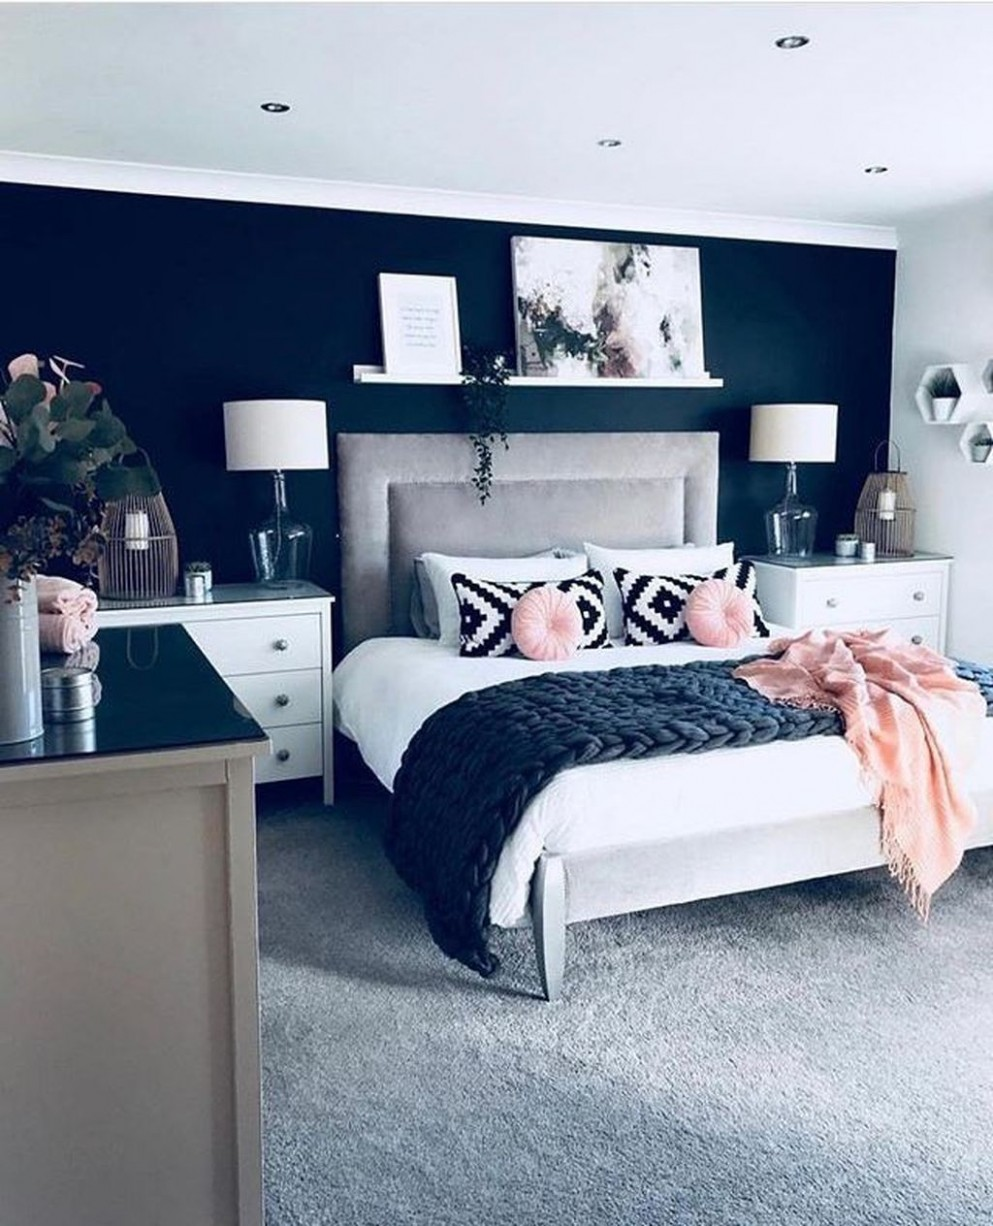 12+ Fancy Master Bedroom Color Scheme Ideas - TRENDHMDCR  Master  - Bedroom Ideas Navy And White